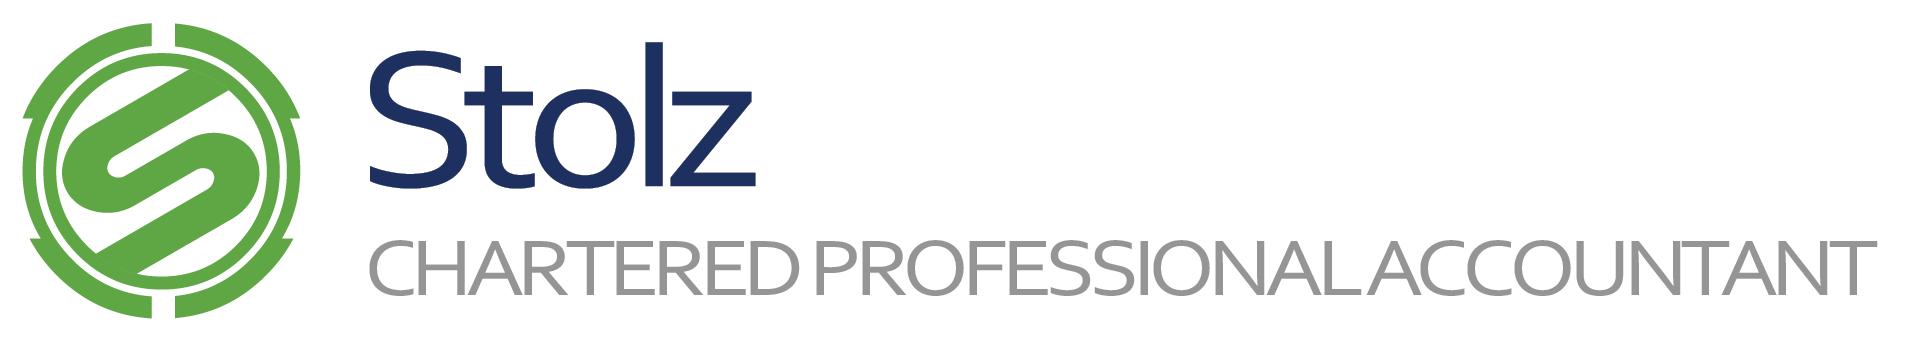 stolz-cpa-logo